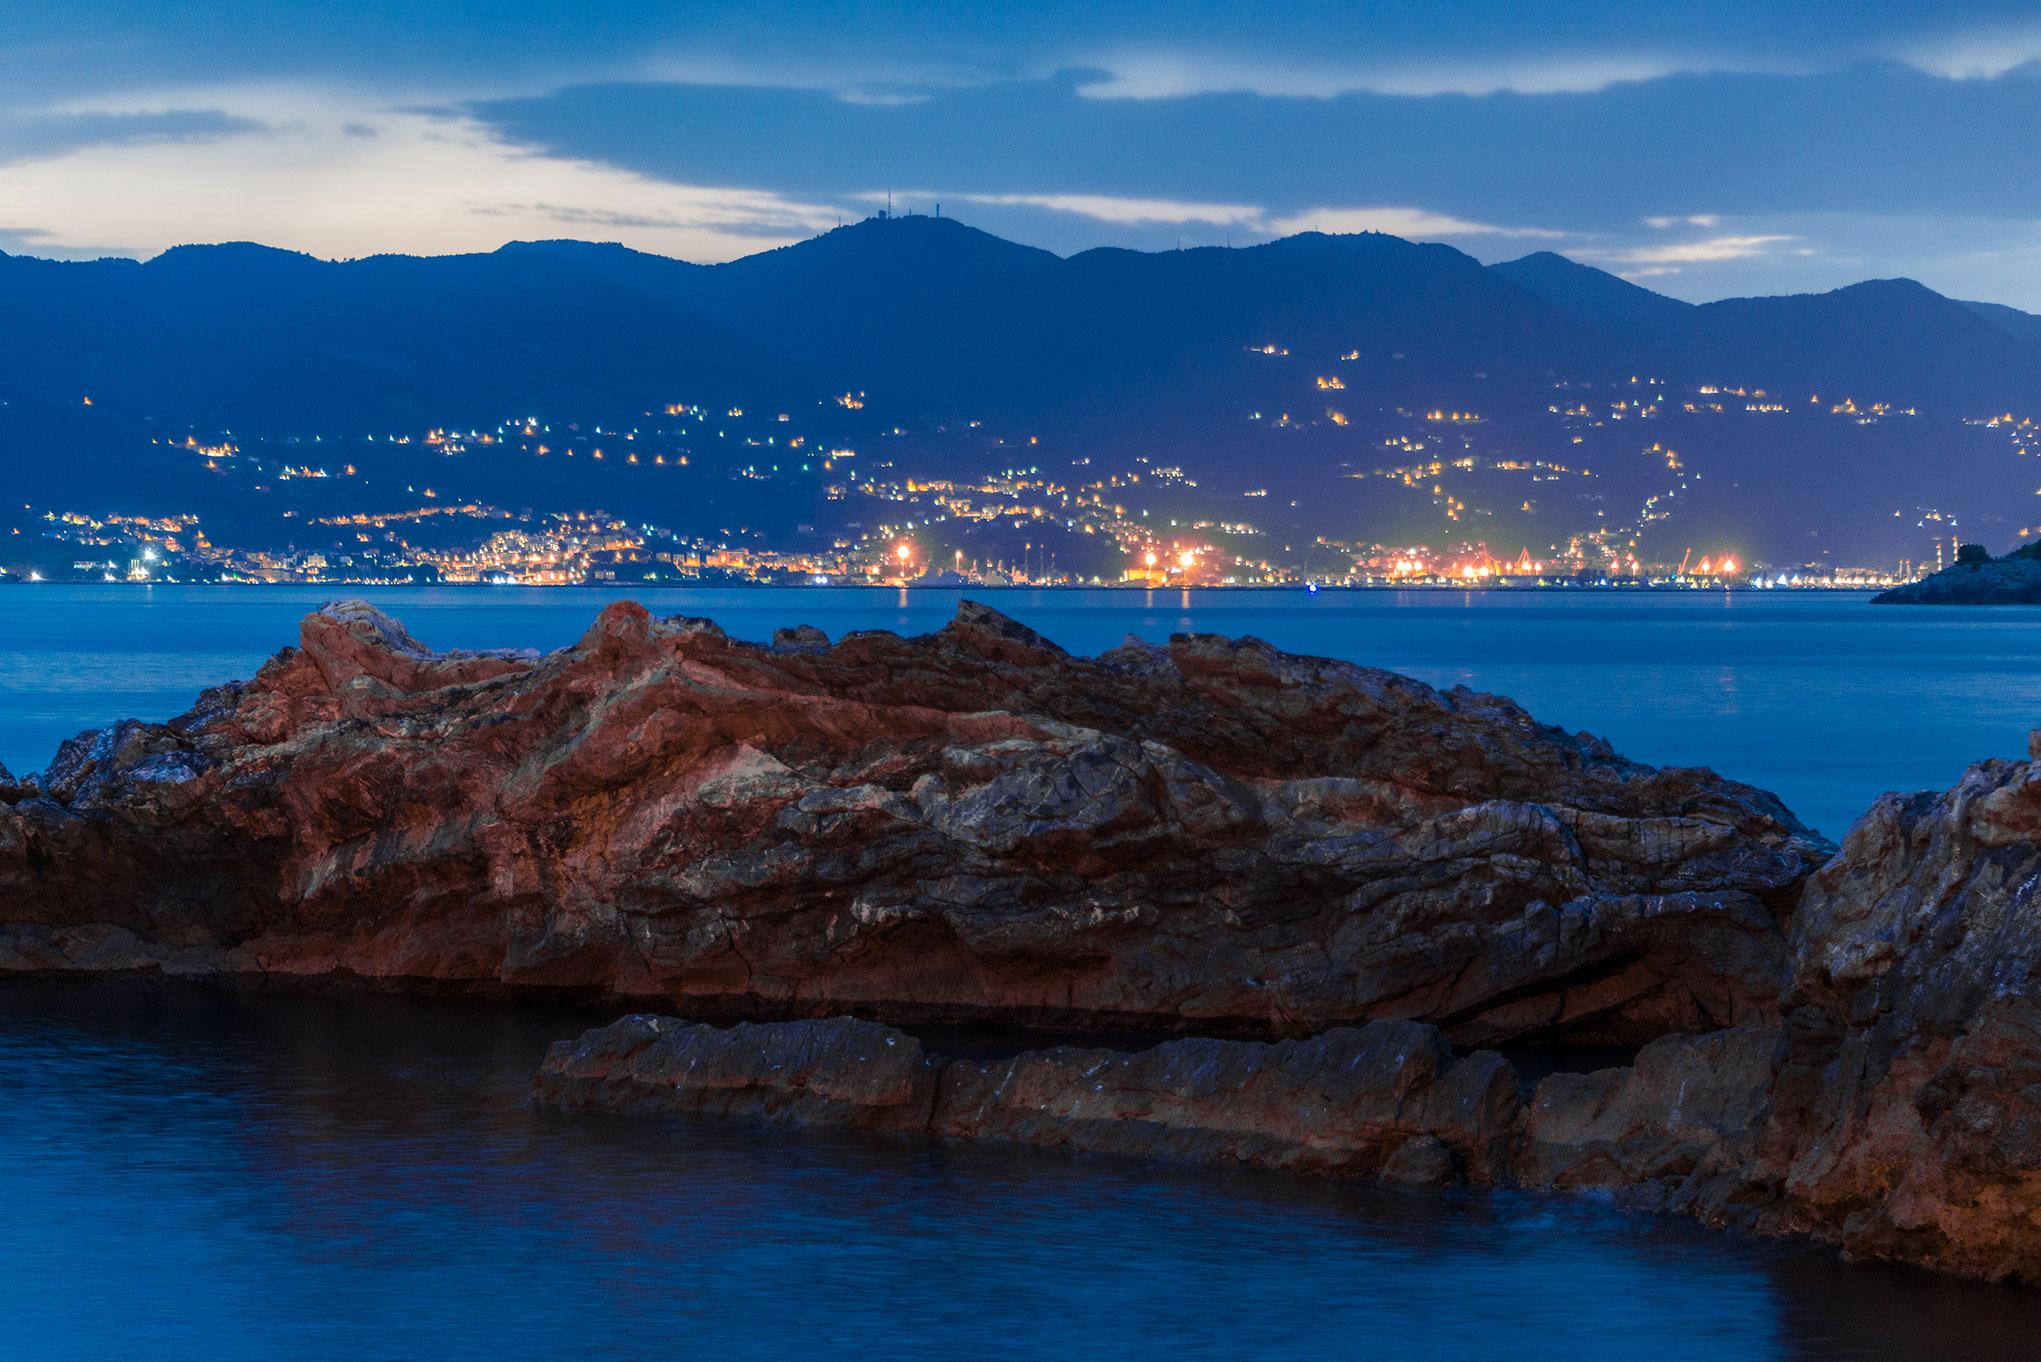 The lights of La Spezia, viewed from Tellaro